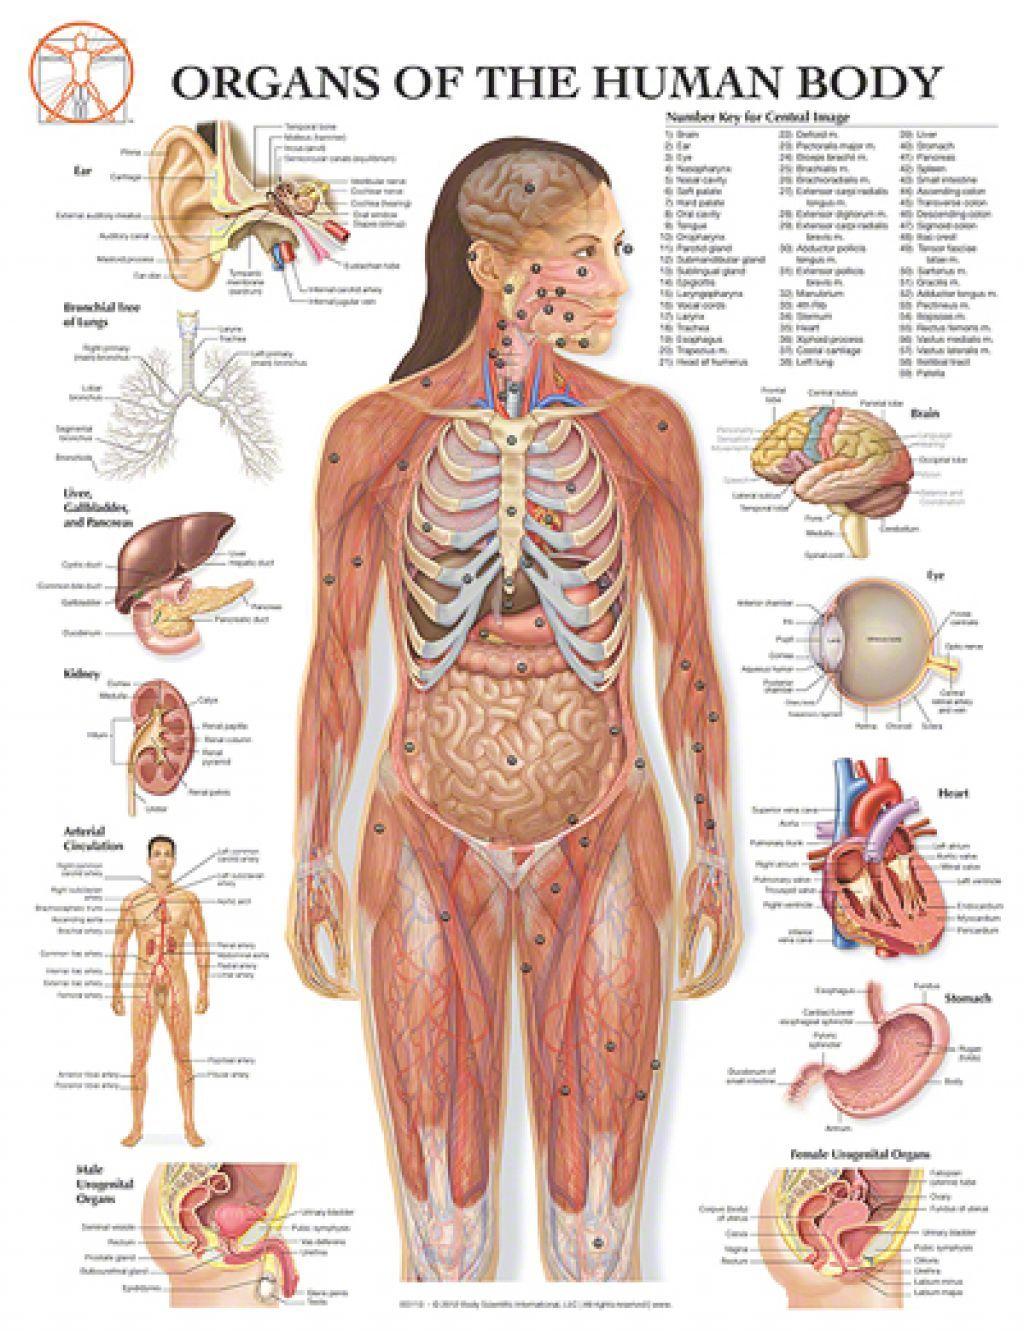 medium resolution of female human body diagram of organs projects to try human body human body diagram female body organs diagram female